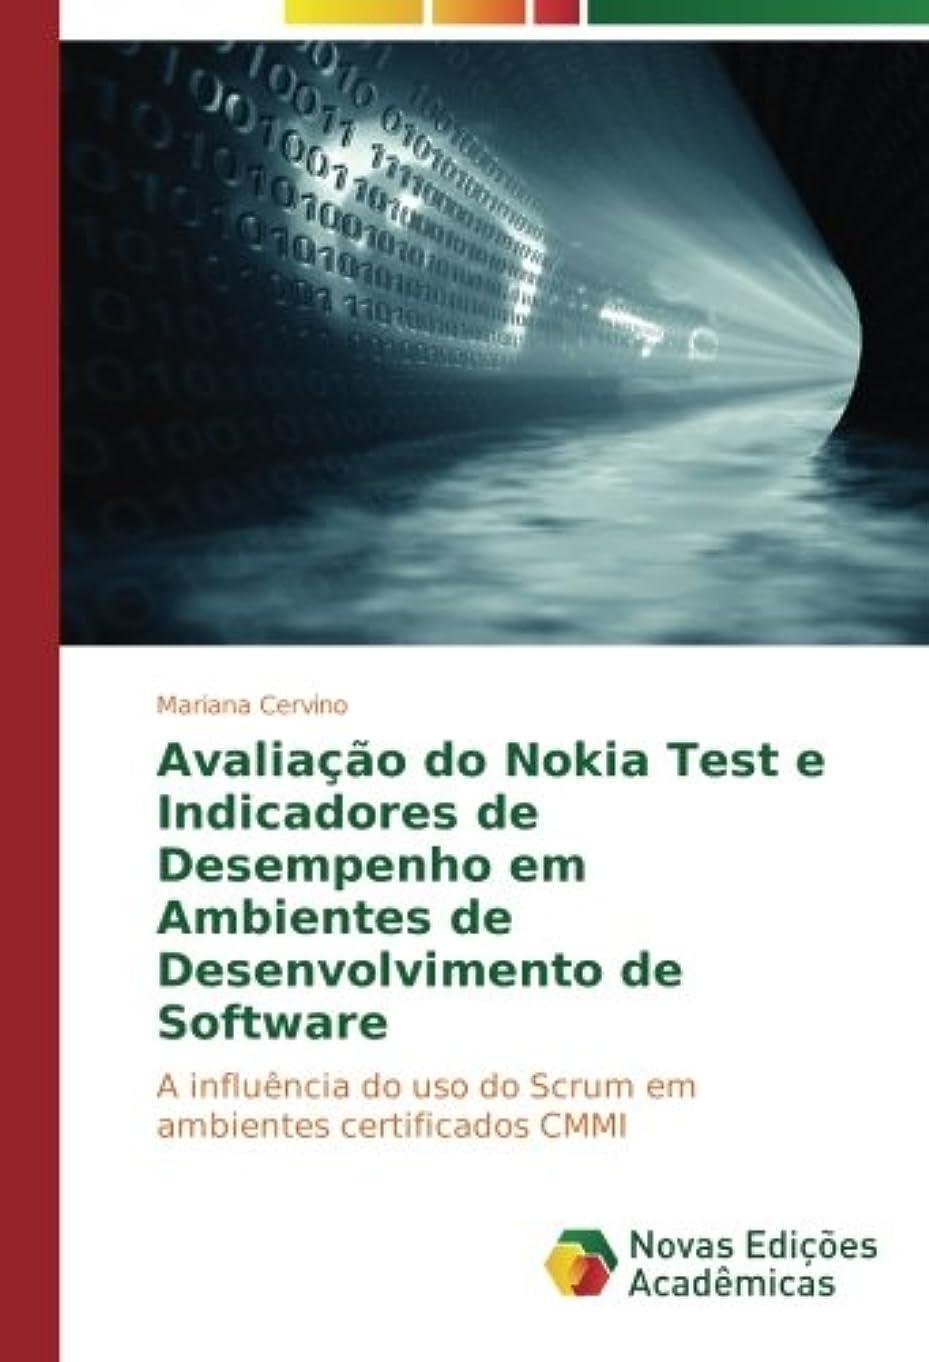 生物学信者オプショナルAvalia??o do Nokia Test e Indicadores de Desempenho em Ambientes de Desenvolvimento de Software: A influência do uso do Scrum em ambientes certificados CMMI